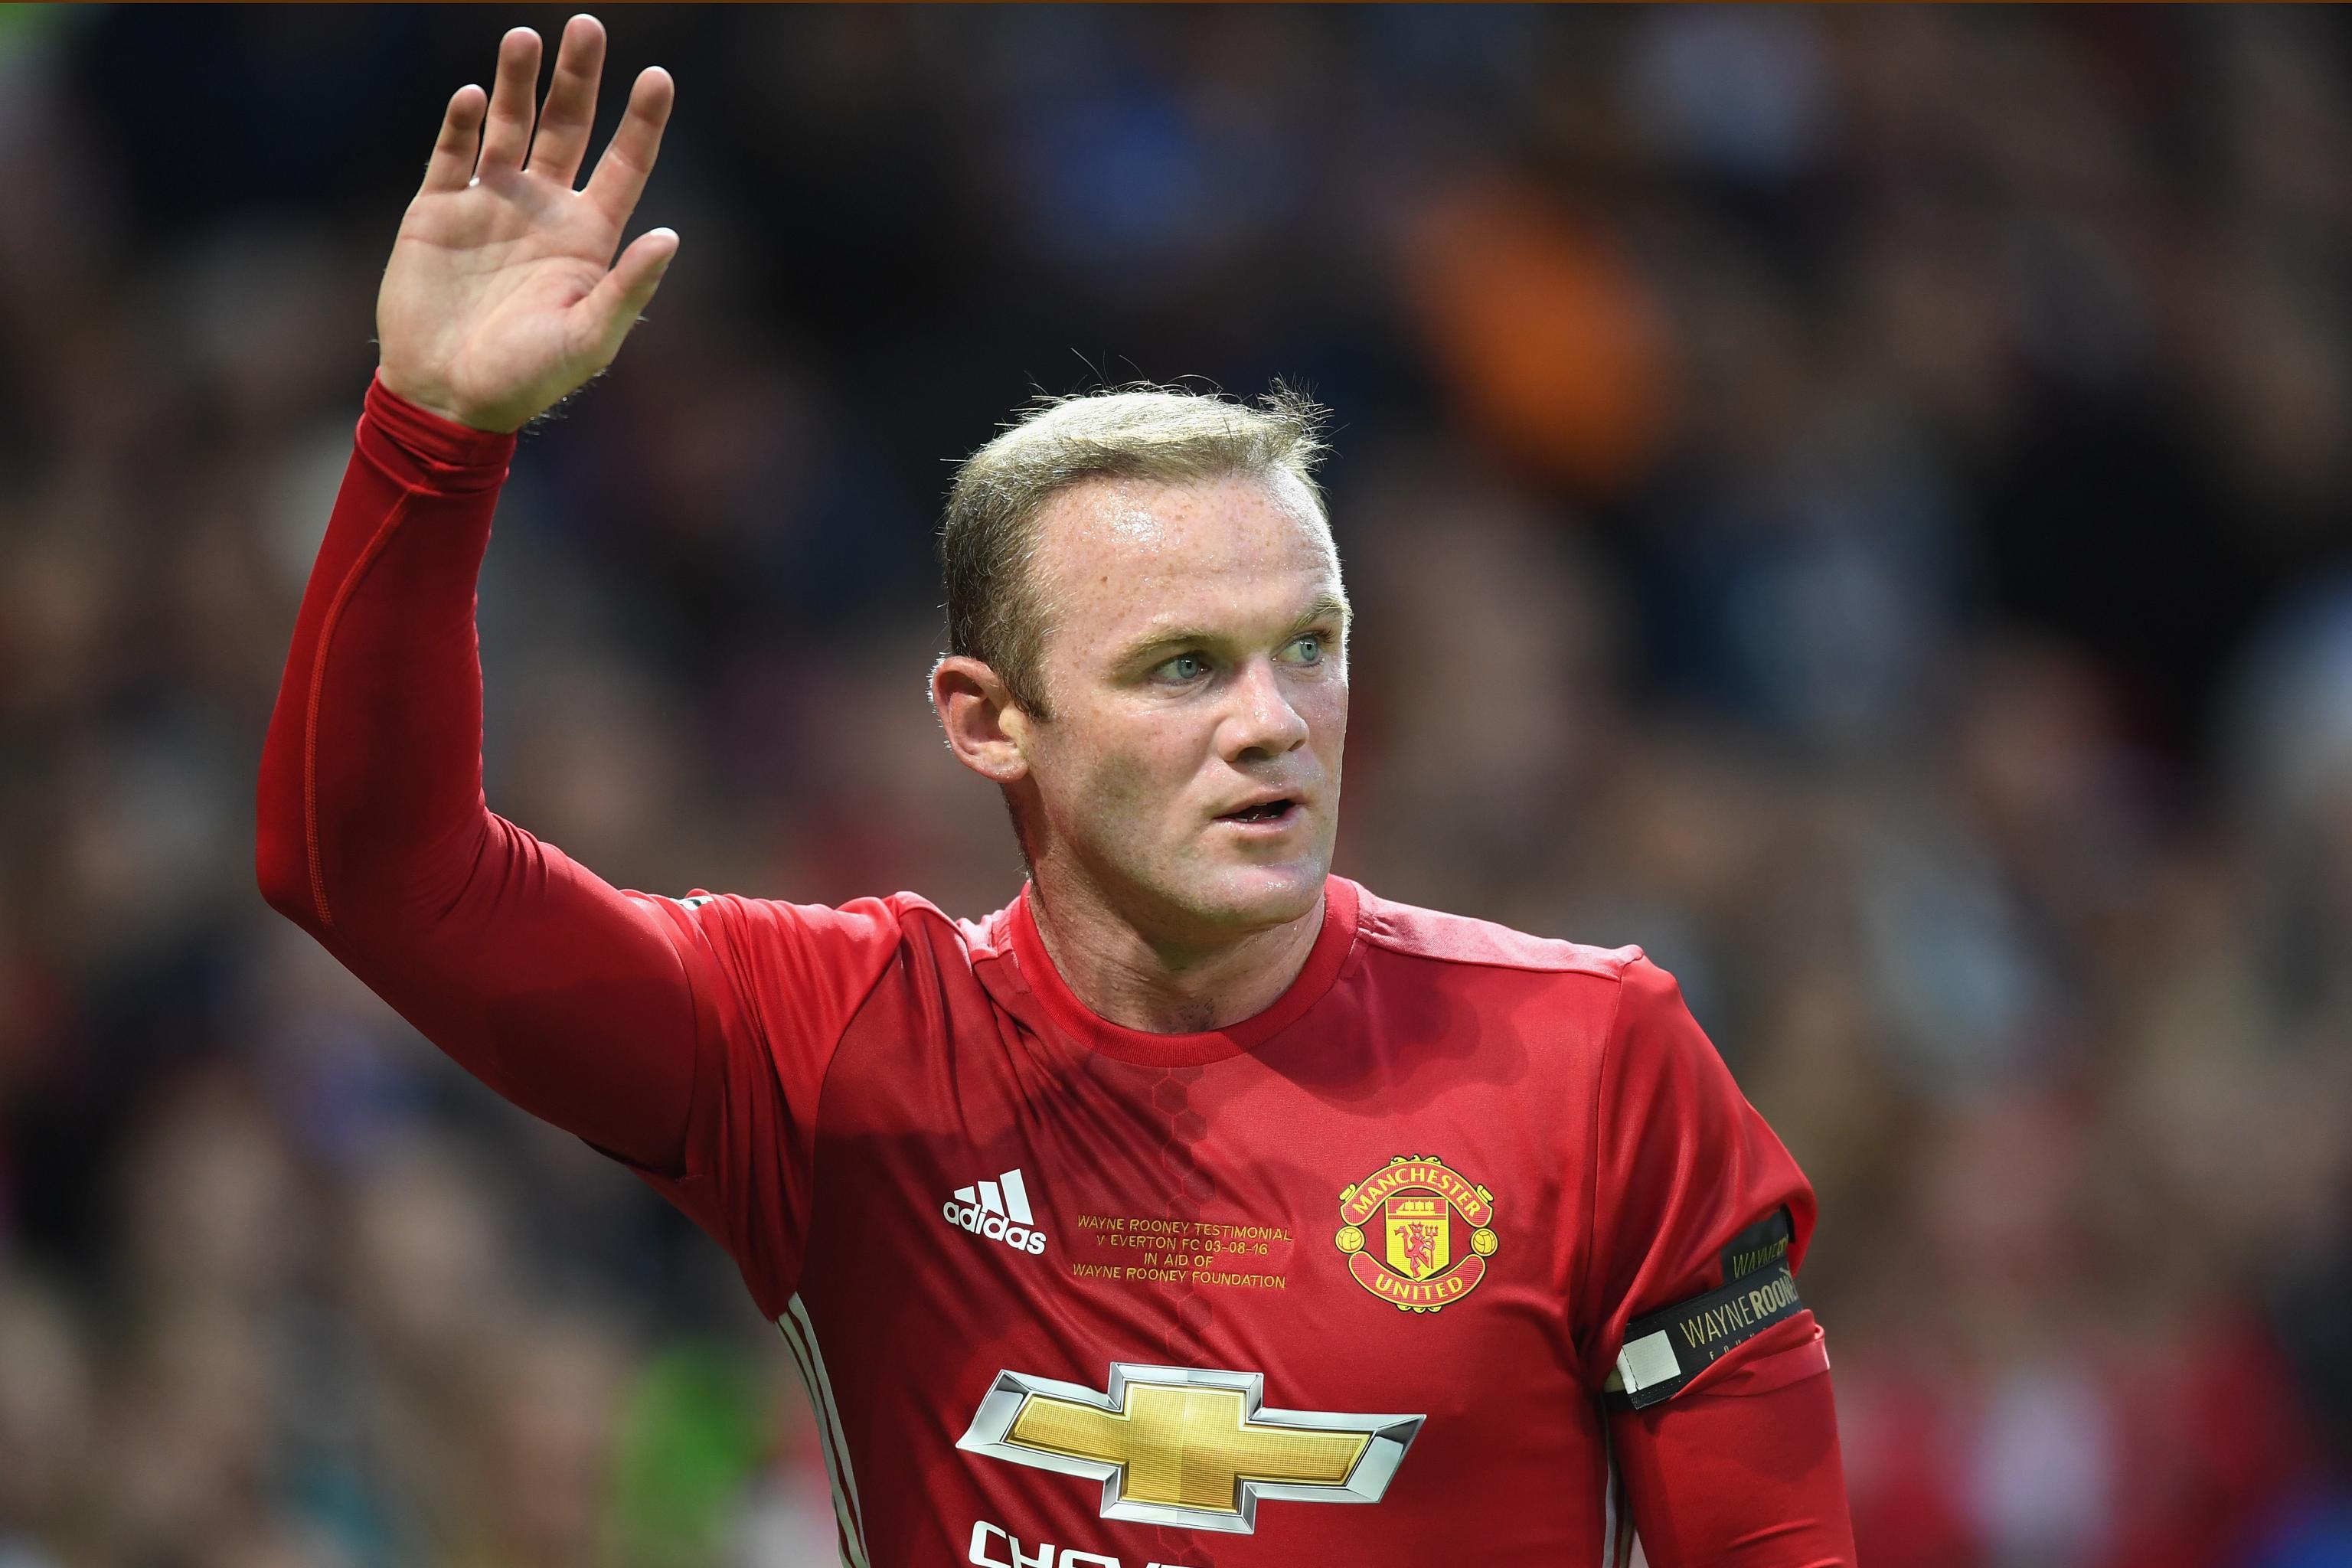 Wayne Rooney Testimonial Score Reaction From Manchester United Vs Everton Bleacher Report Latest News Videos And Highlights